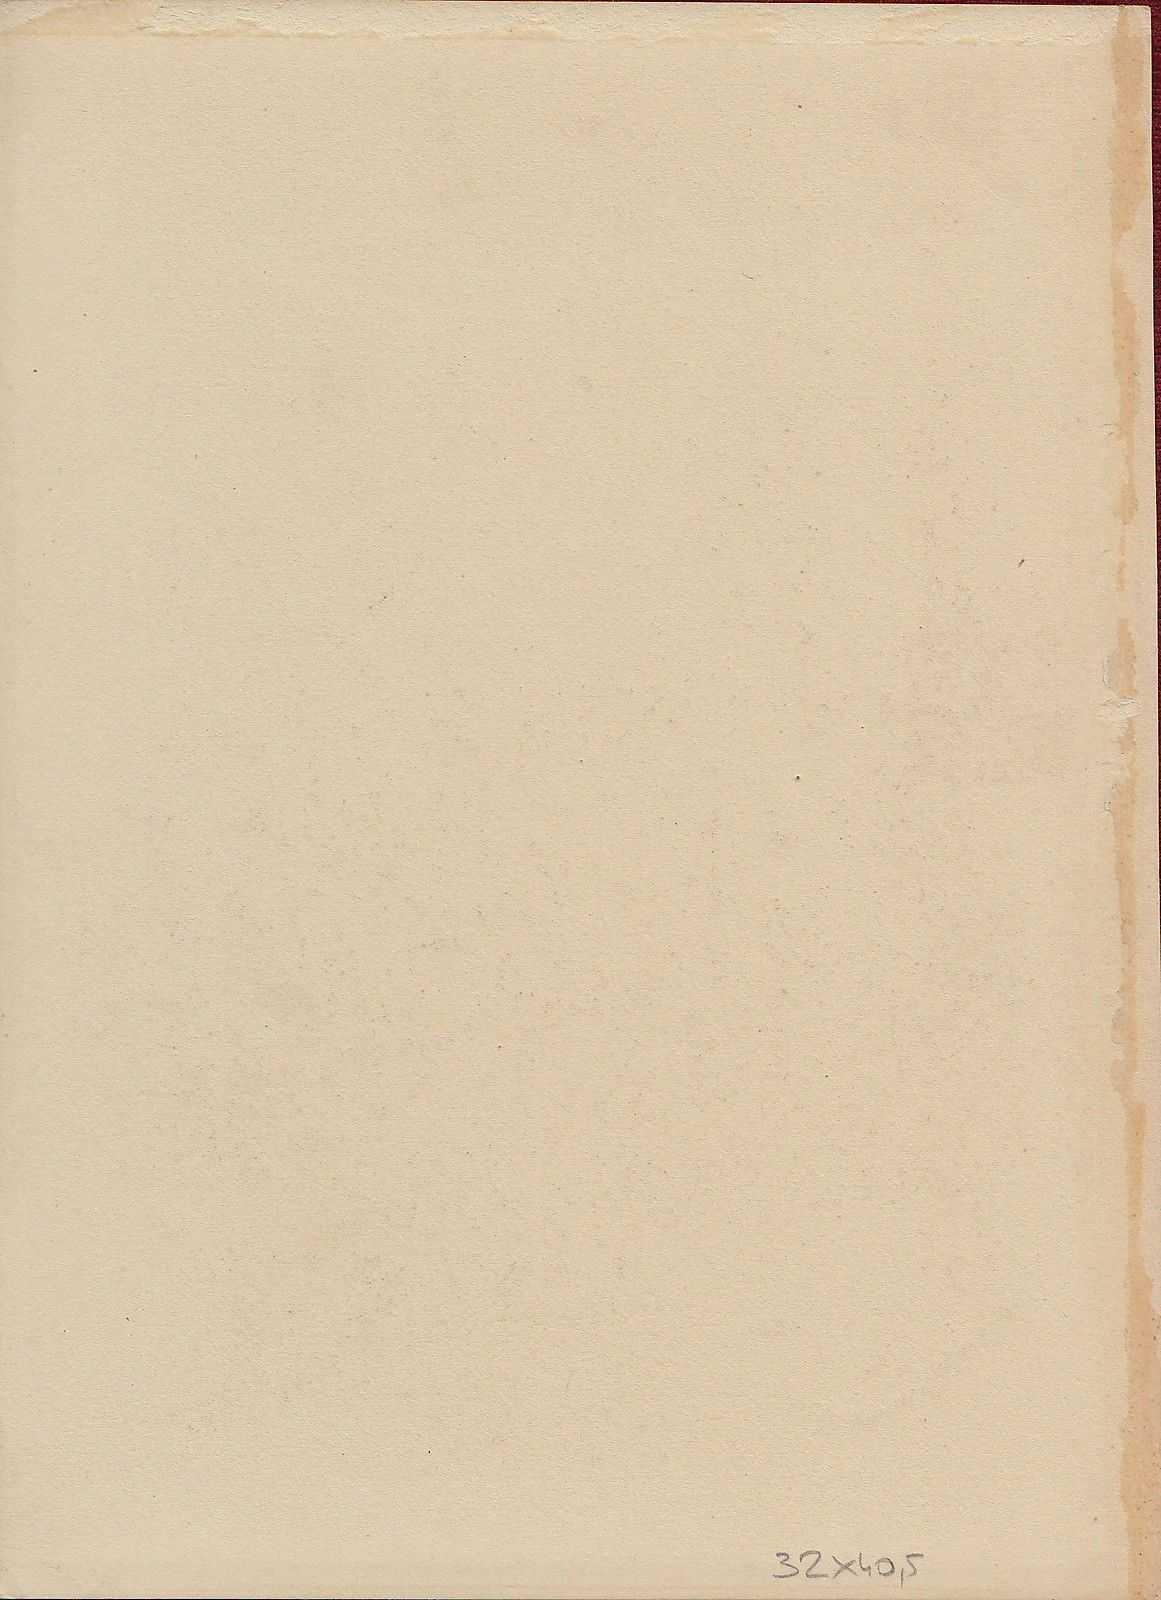 1885-Copperplate-Engraving-Siebengebirge-National-Park-Germany-Bernhard-Mannfeld-182181555132-3